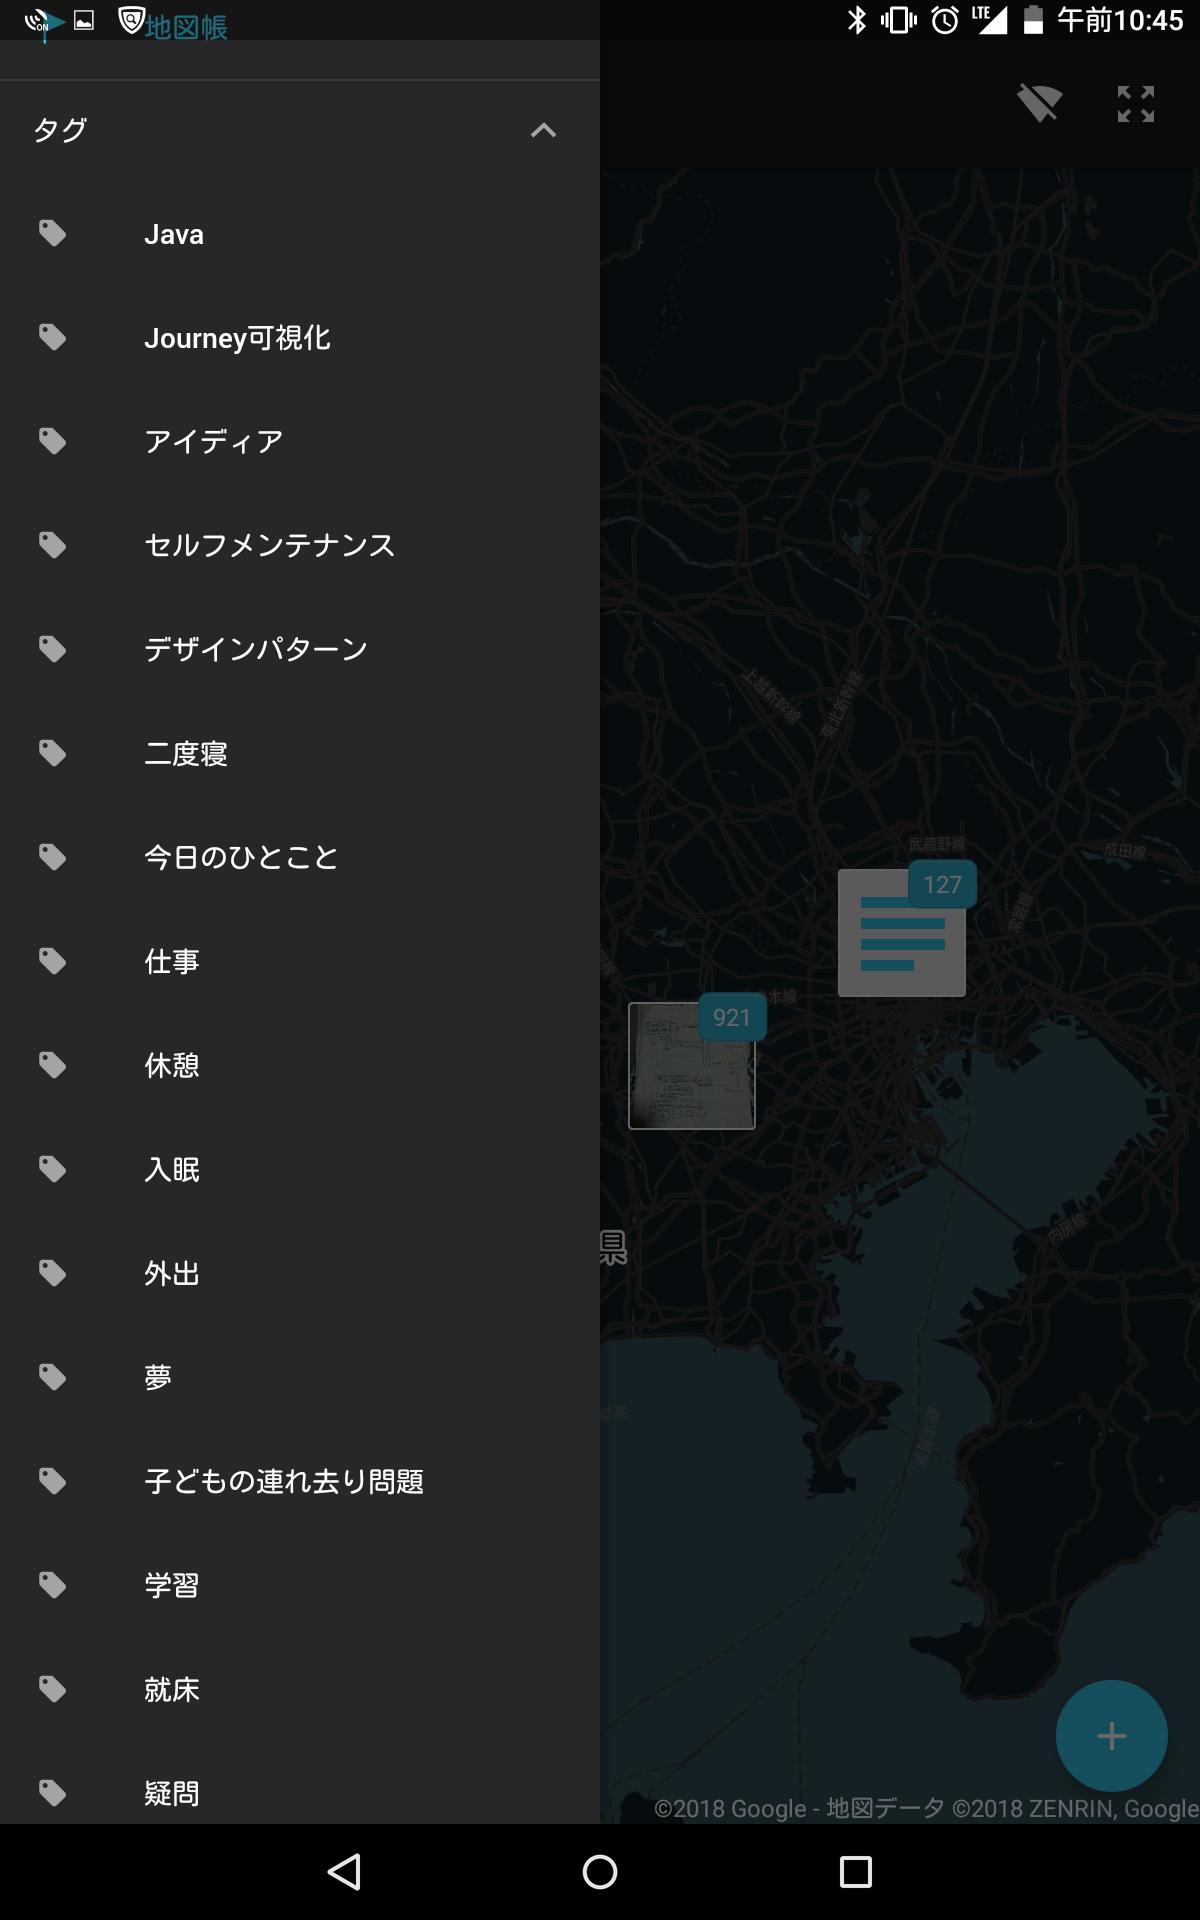 Screenshot_2018-04-17-10-45-30.png